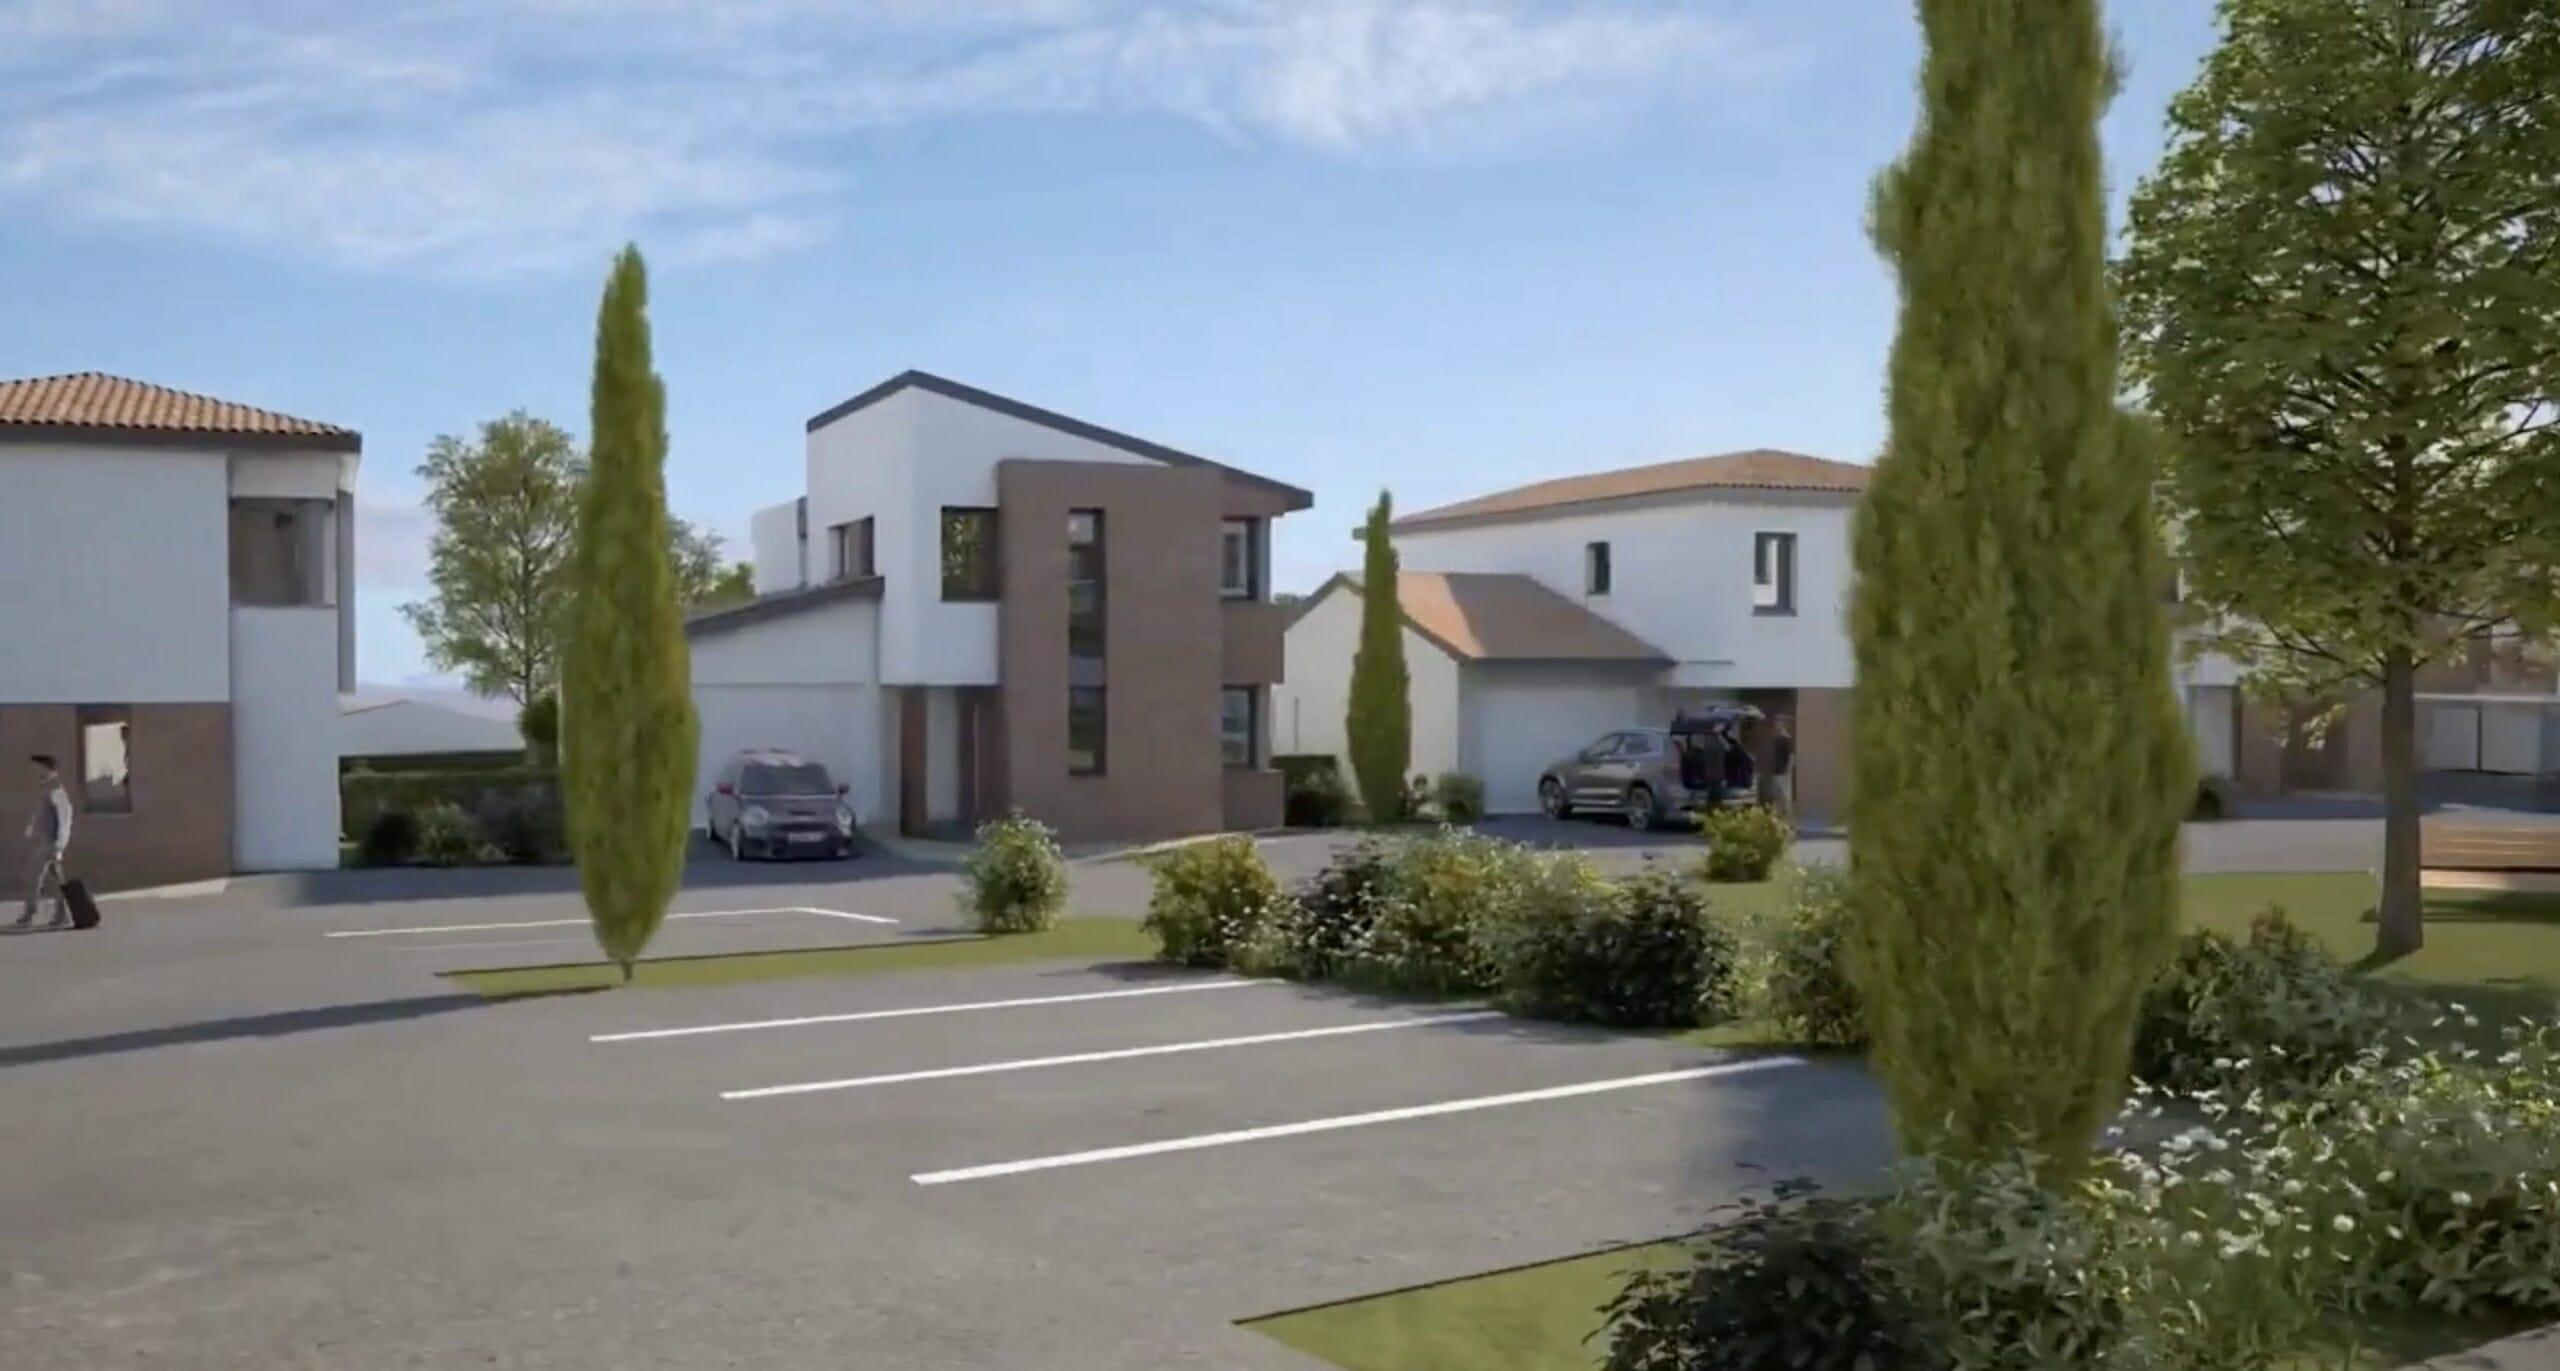 UrbanHouse360-Villa-Valéria-Auzeville-Tolosane